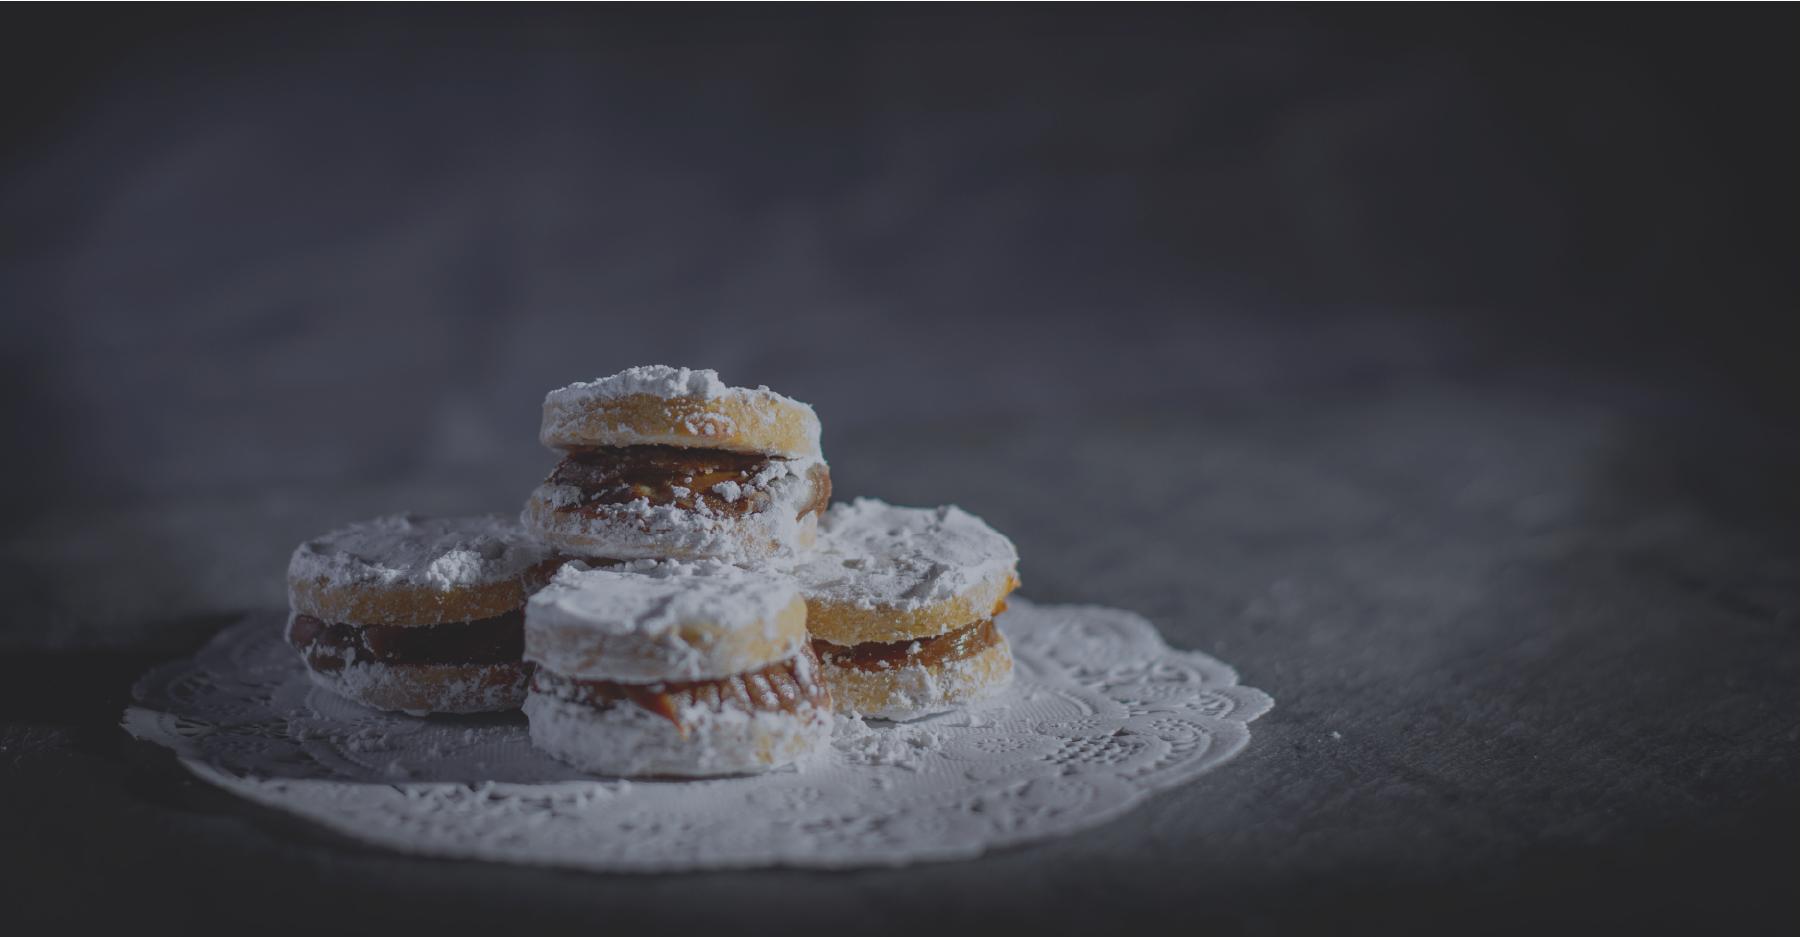 Alafajores cookies